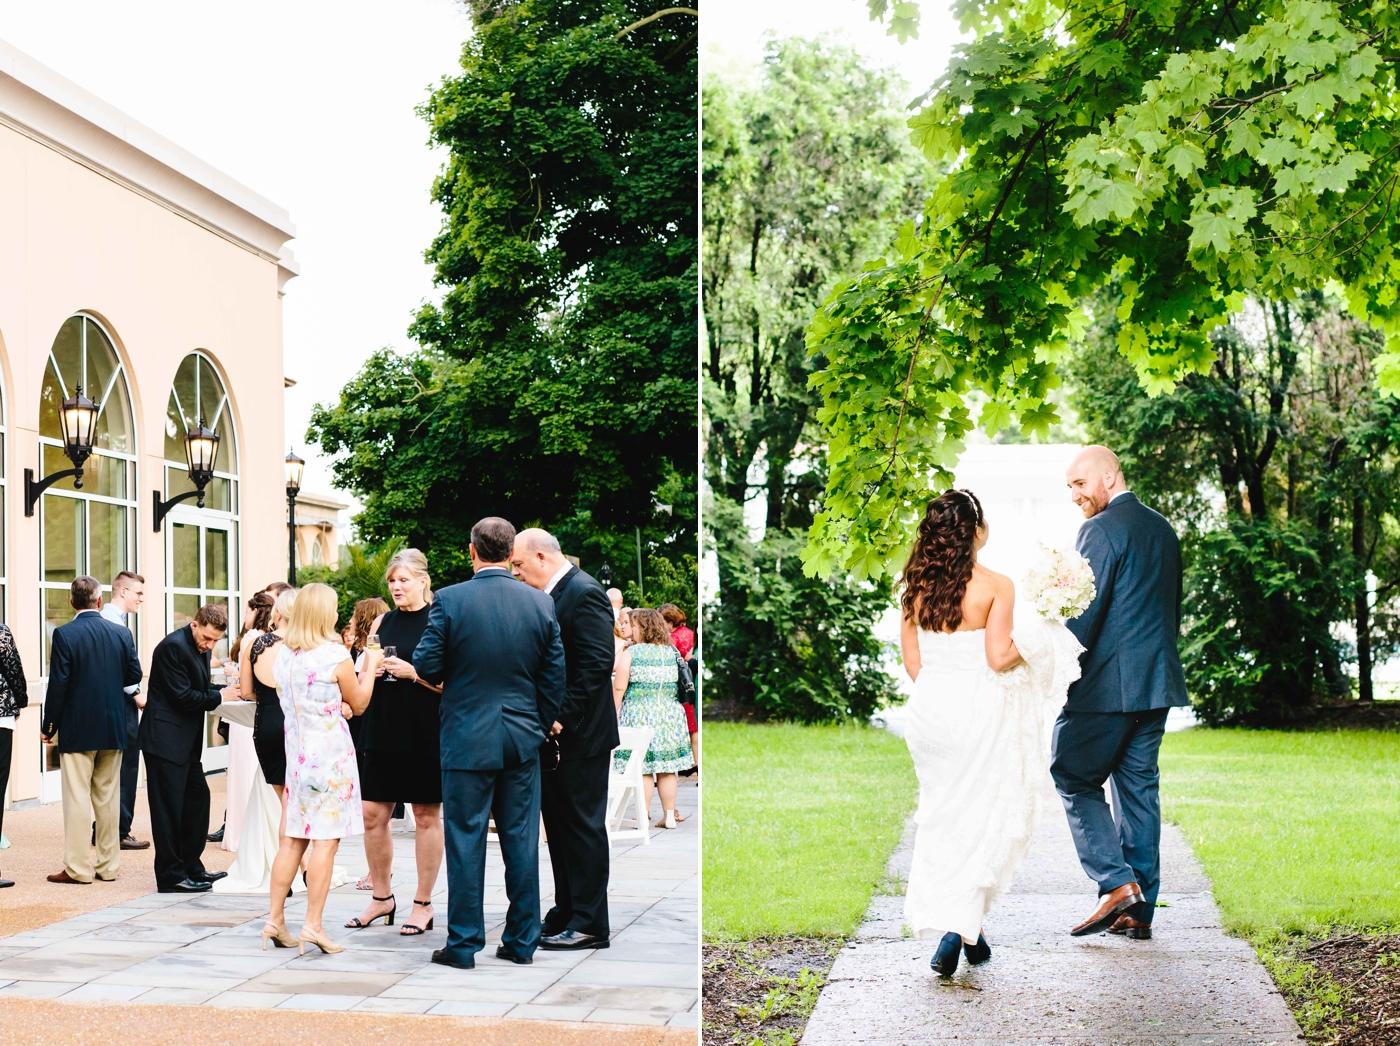 chicago-fine-art-wedding-photography-svihra14